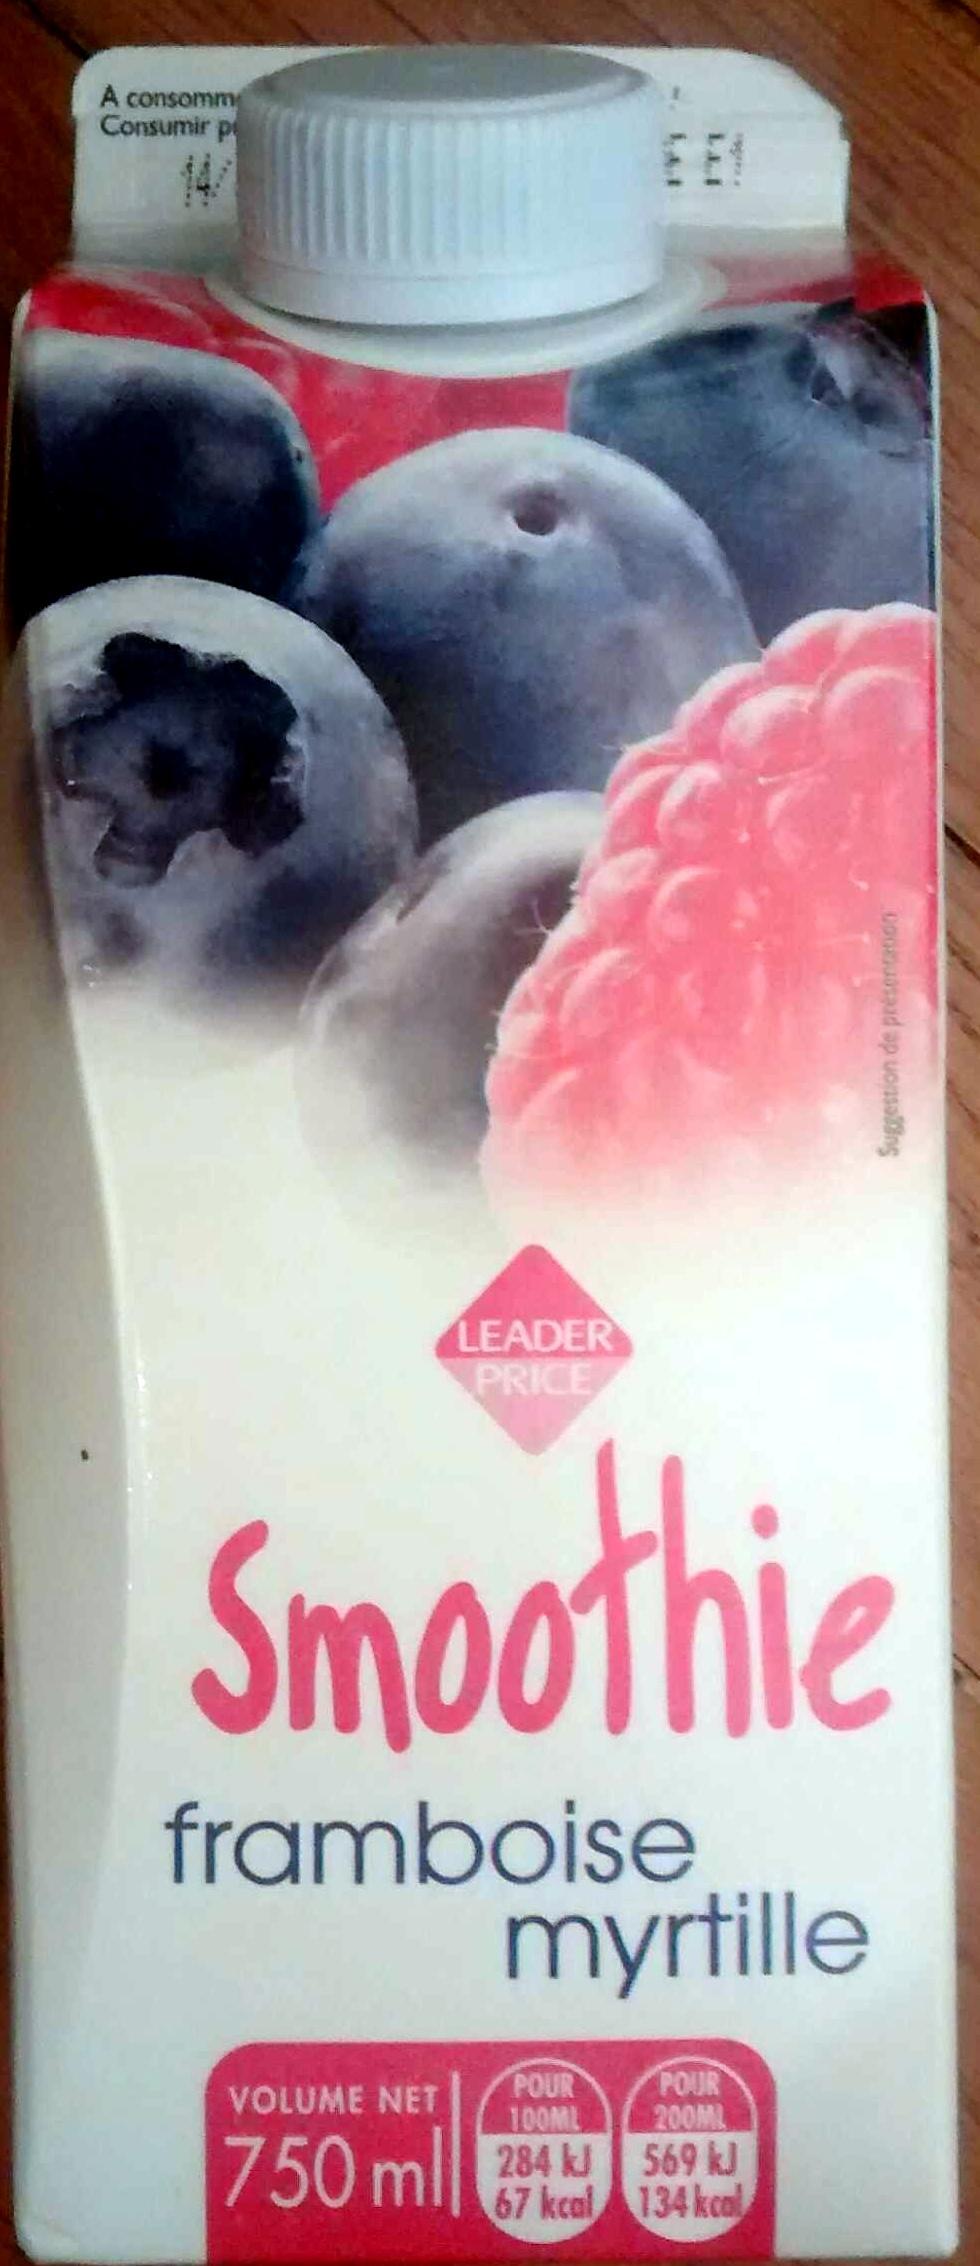 Smoothie framboise myrtille - Produit - fr